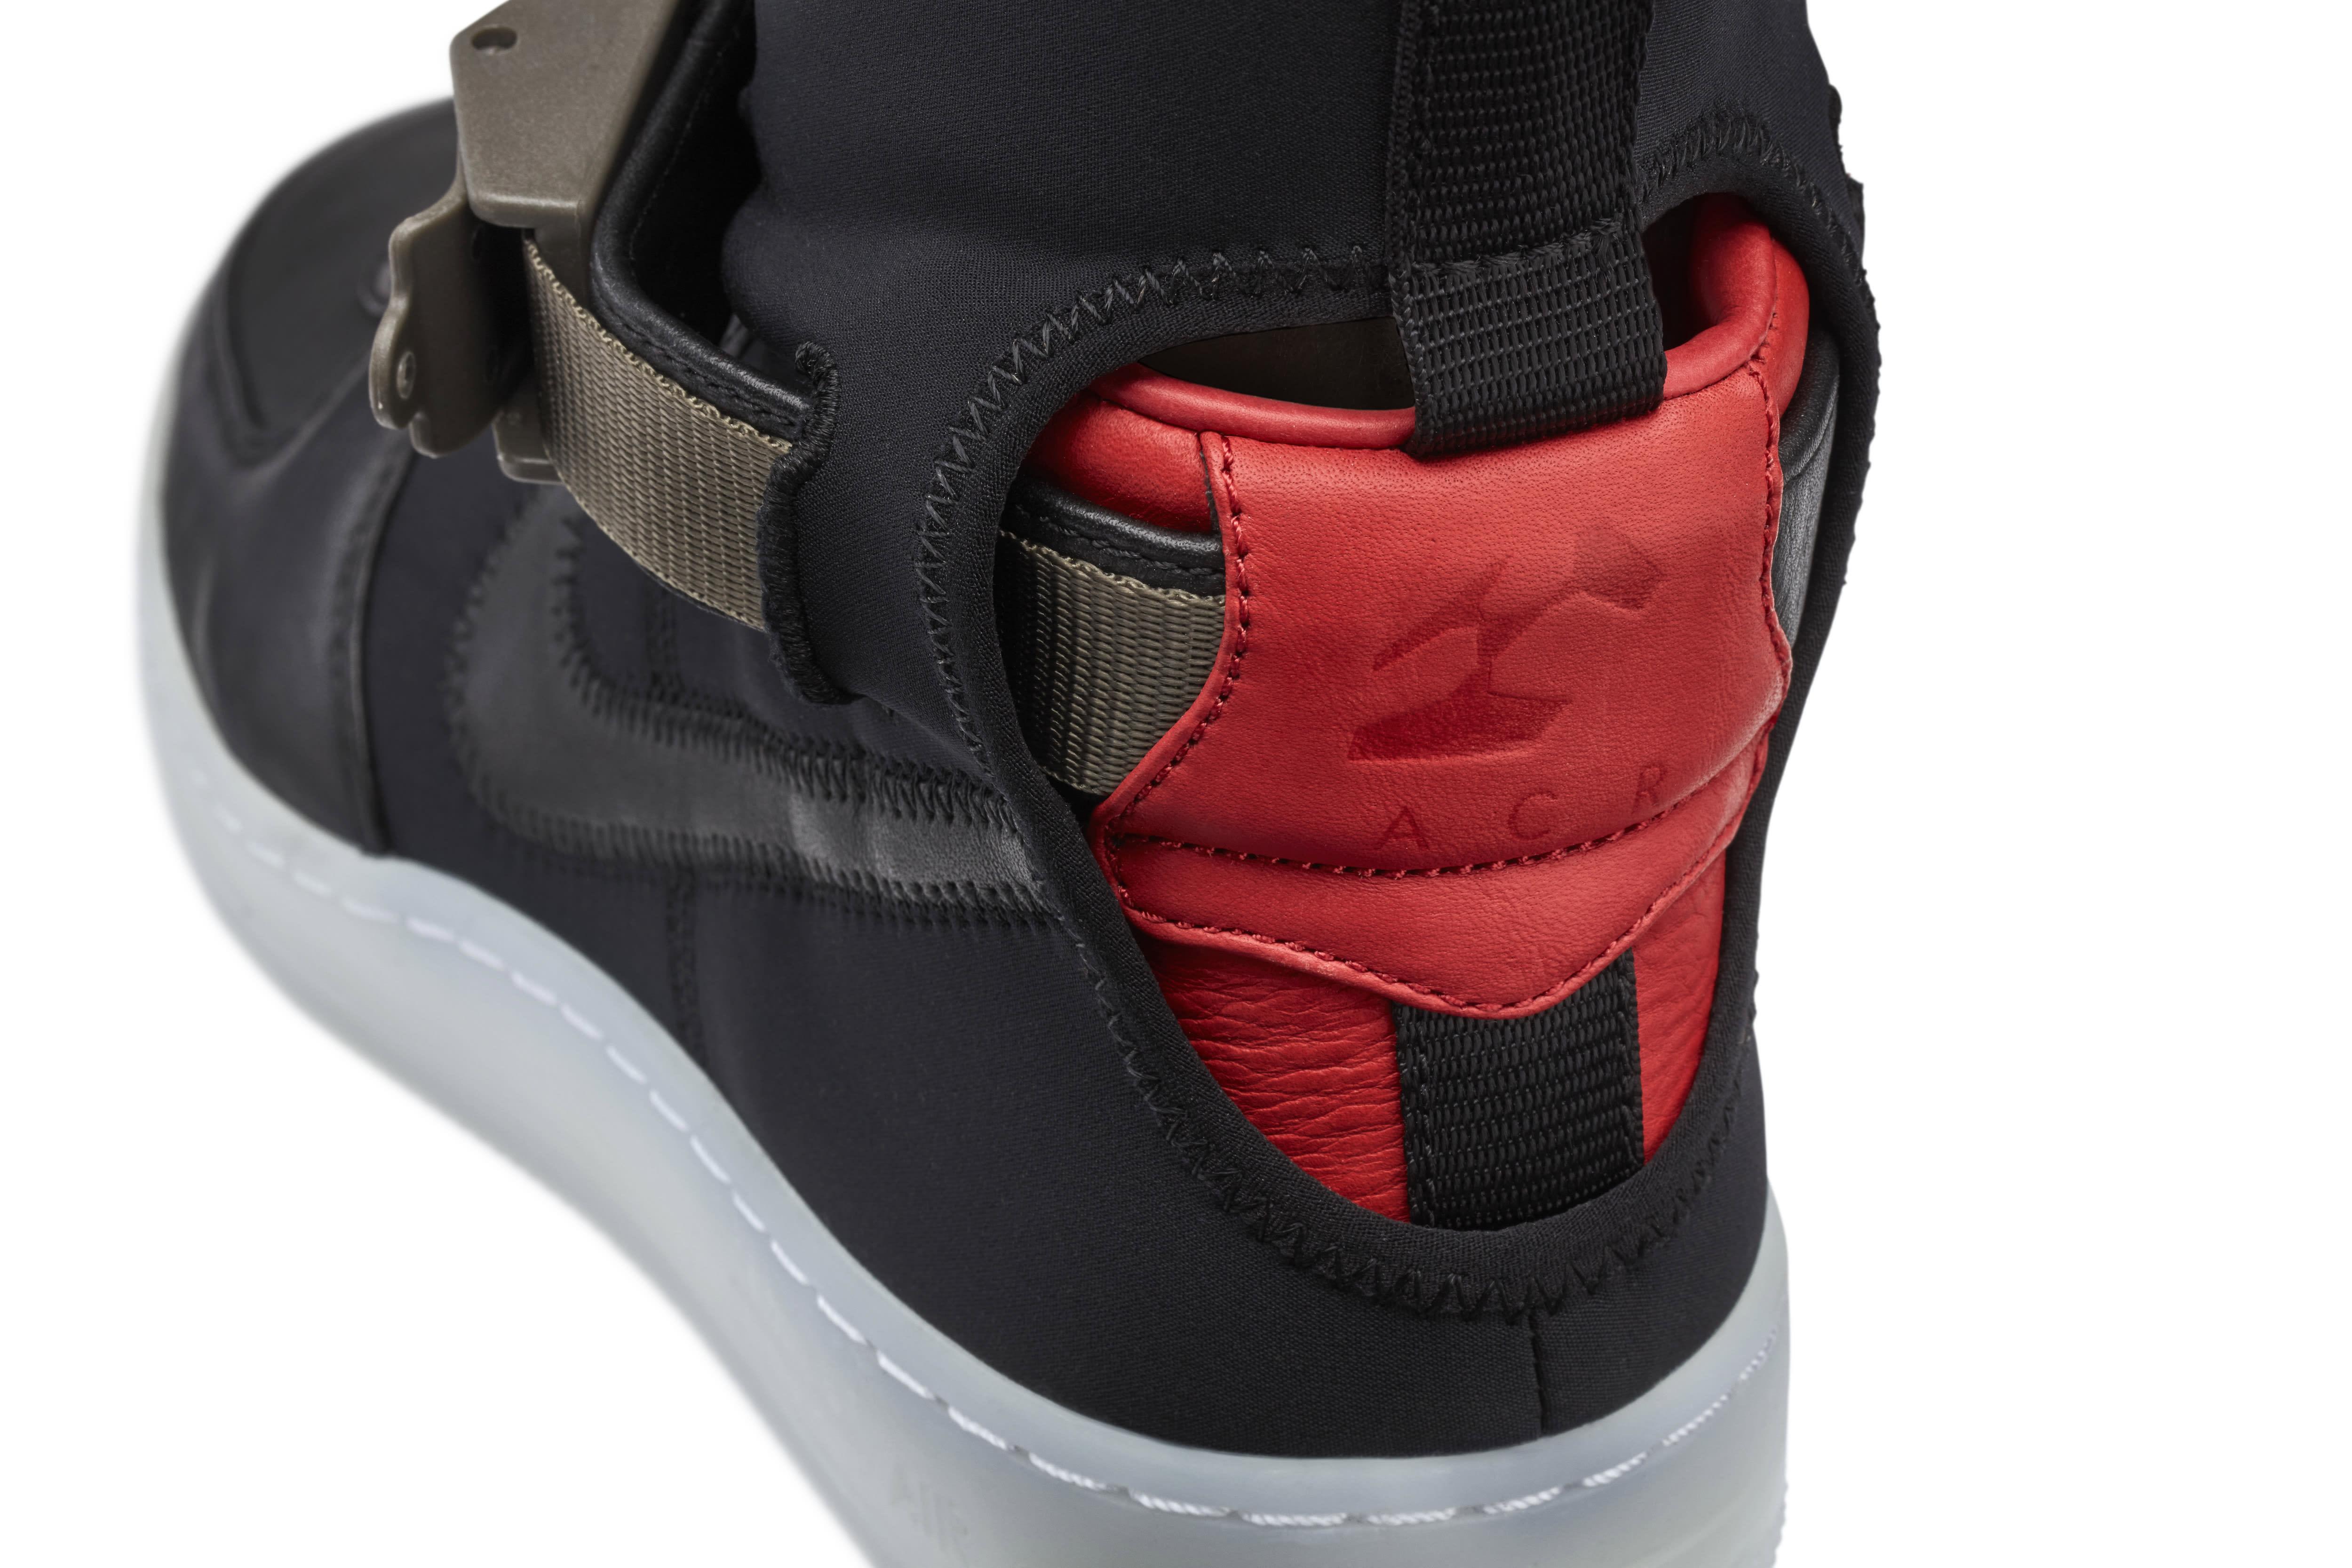 detailed look 0e36c aff70 Image via Nike NikeLab Air Force 1 Acronym Black Detail